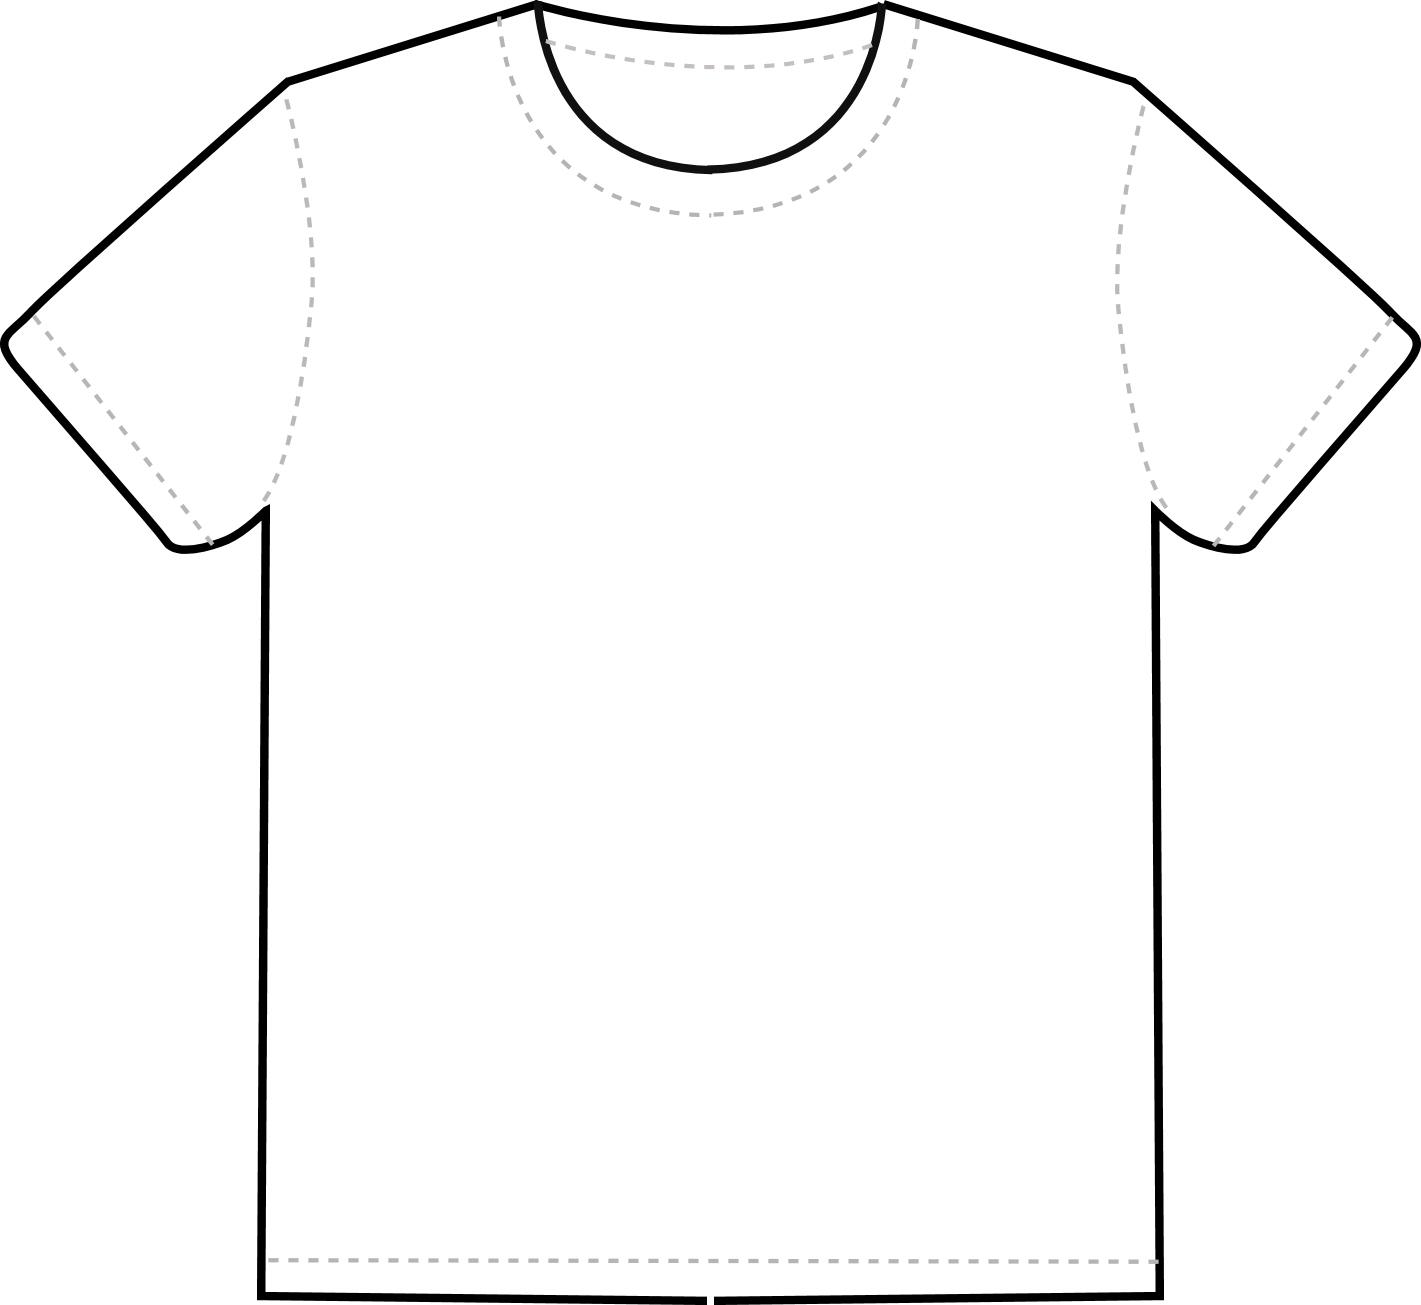 t shirt template clipart clipart suggest. Black Bedroom Furniture Sets. Home Design Ideas